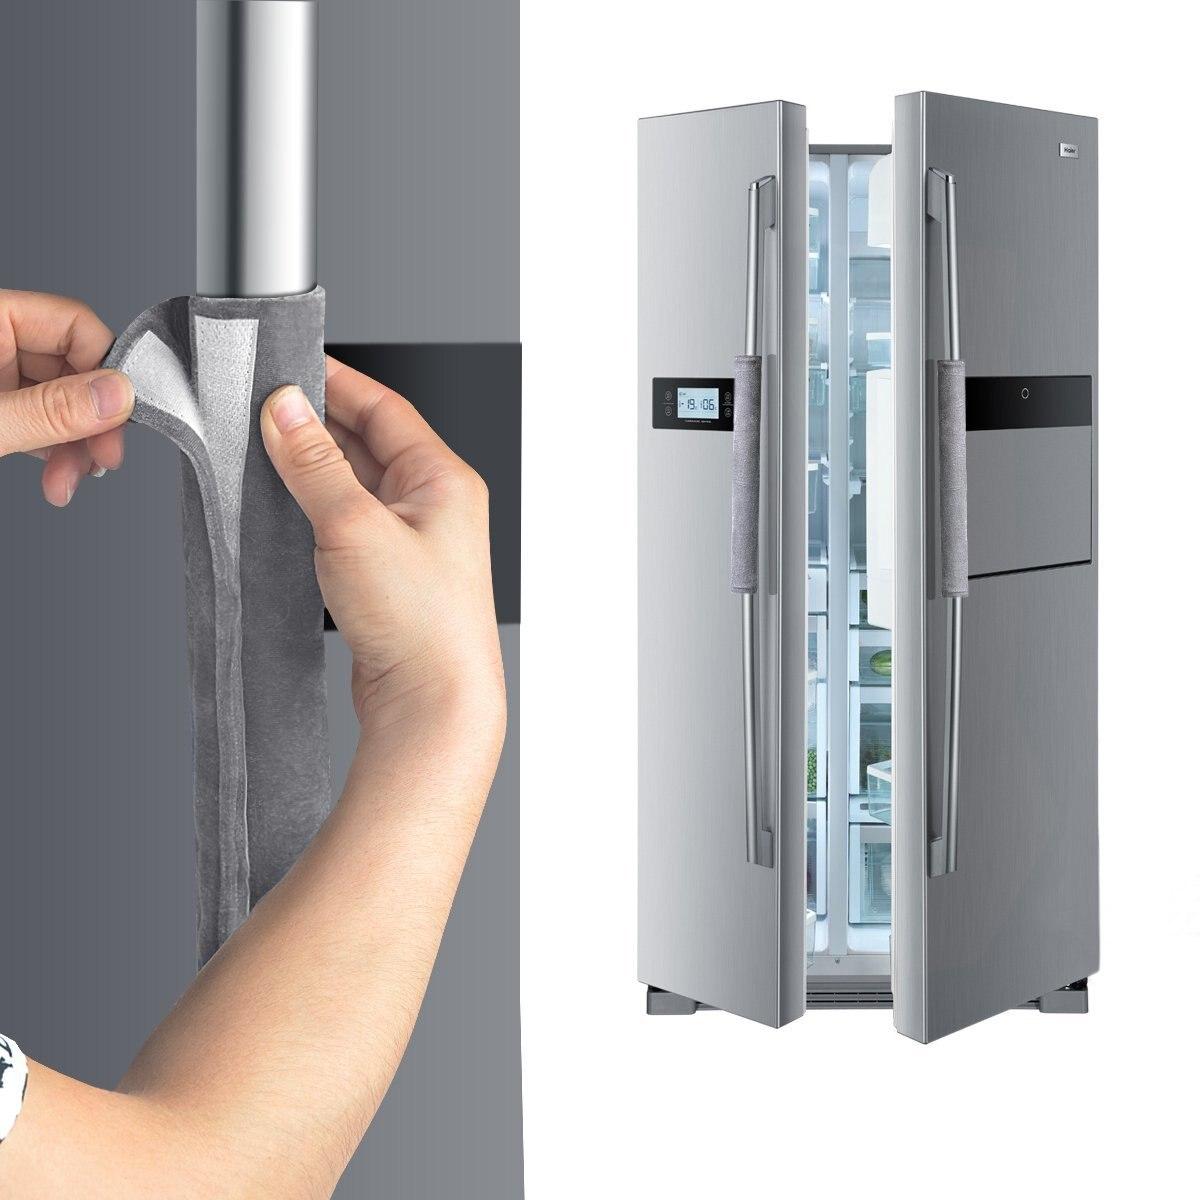 Antiskid:  Refrigerator Door Handle Cover Kitchen Appliance Decor Handles Antiskid Protector Gloves for Fridge Oven Keep off Fingerprints - Martin's & Co